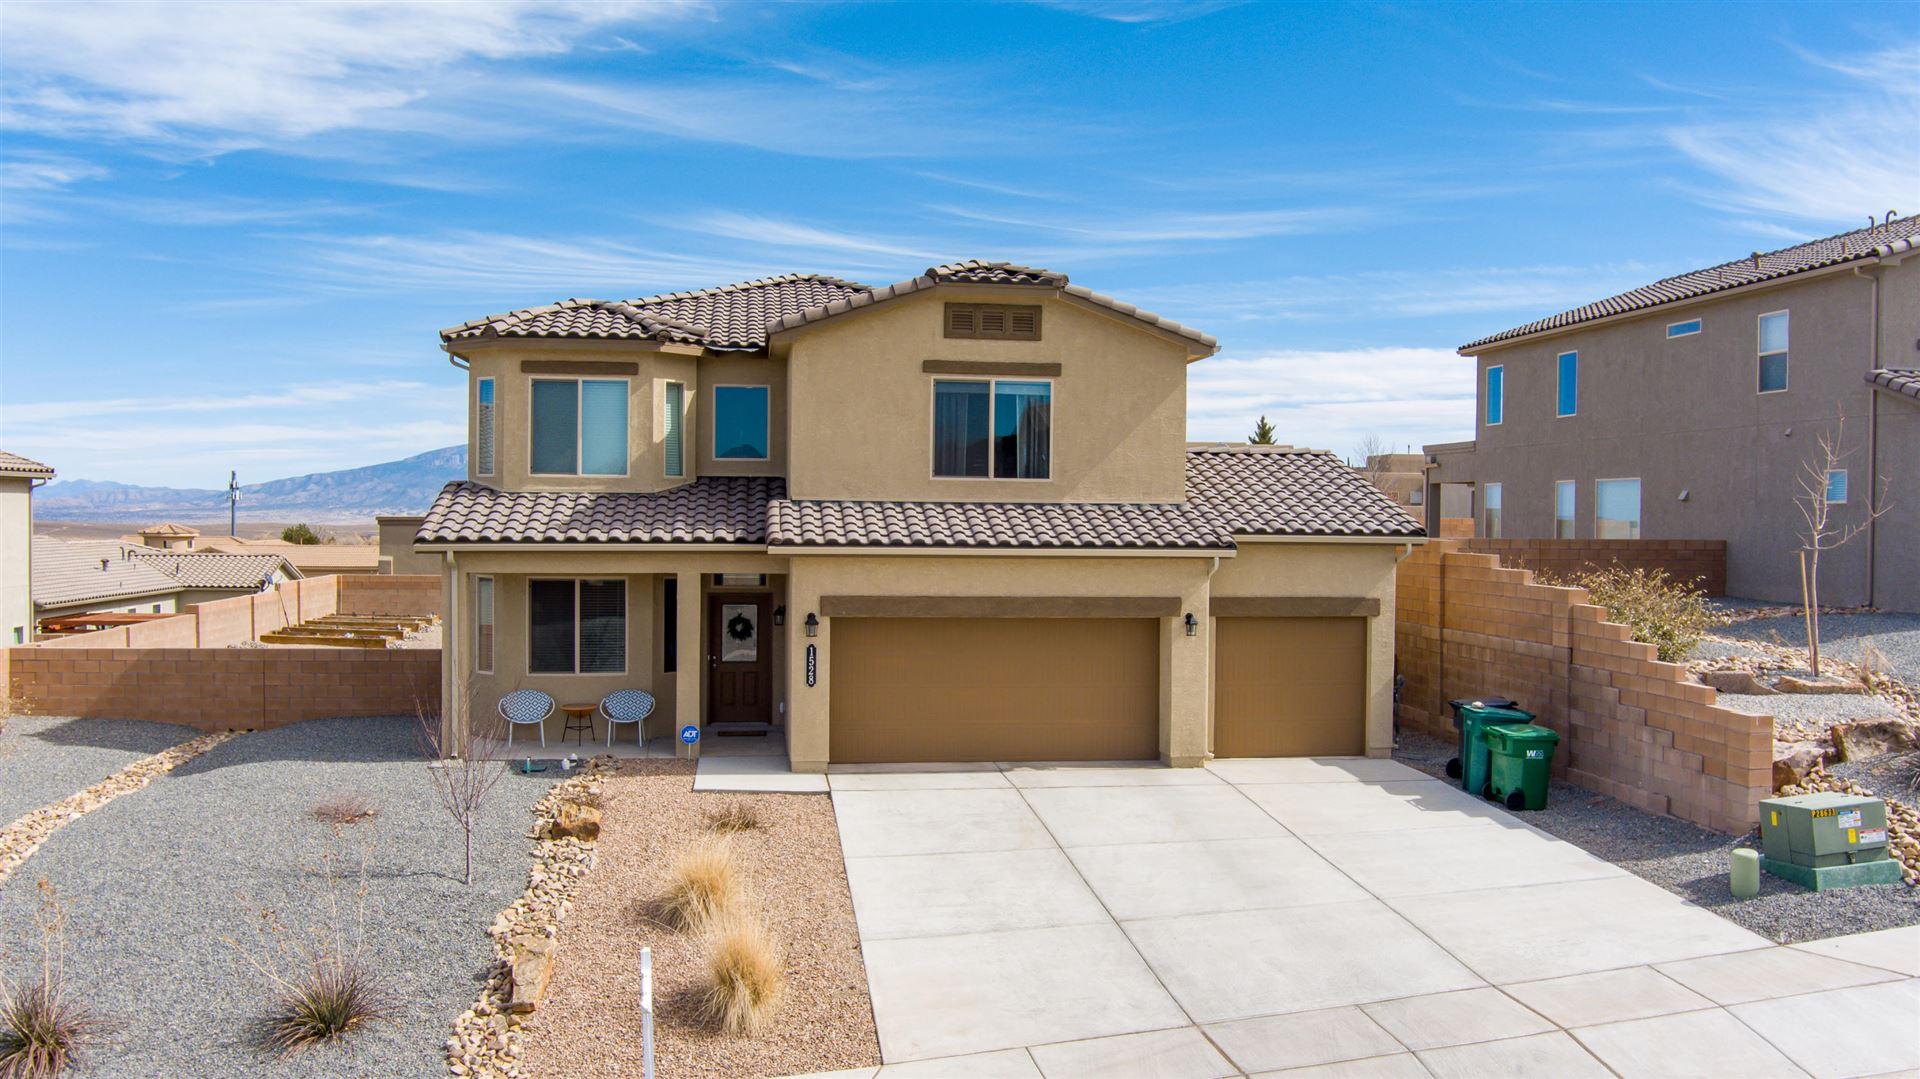 1528 BLUE SPRUCE Drive NE, Rio Rancho, NM 87144 - MLS#: 986553